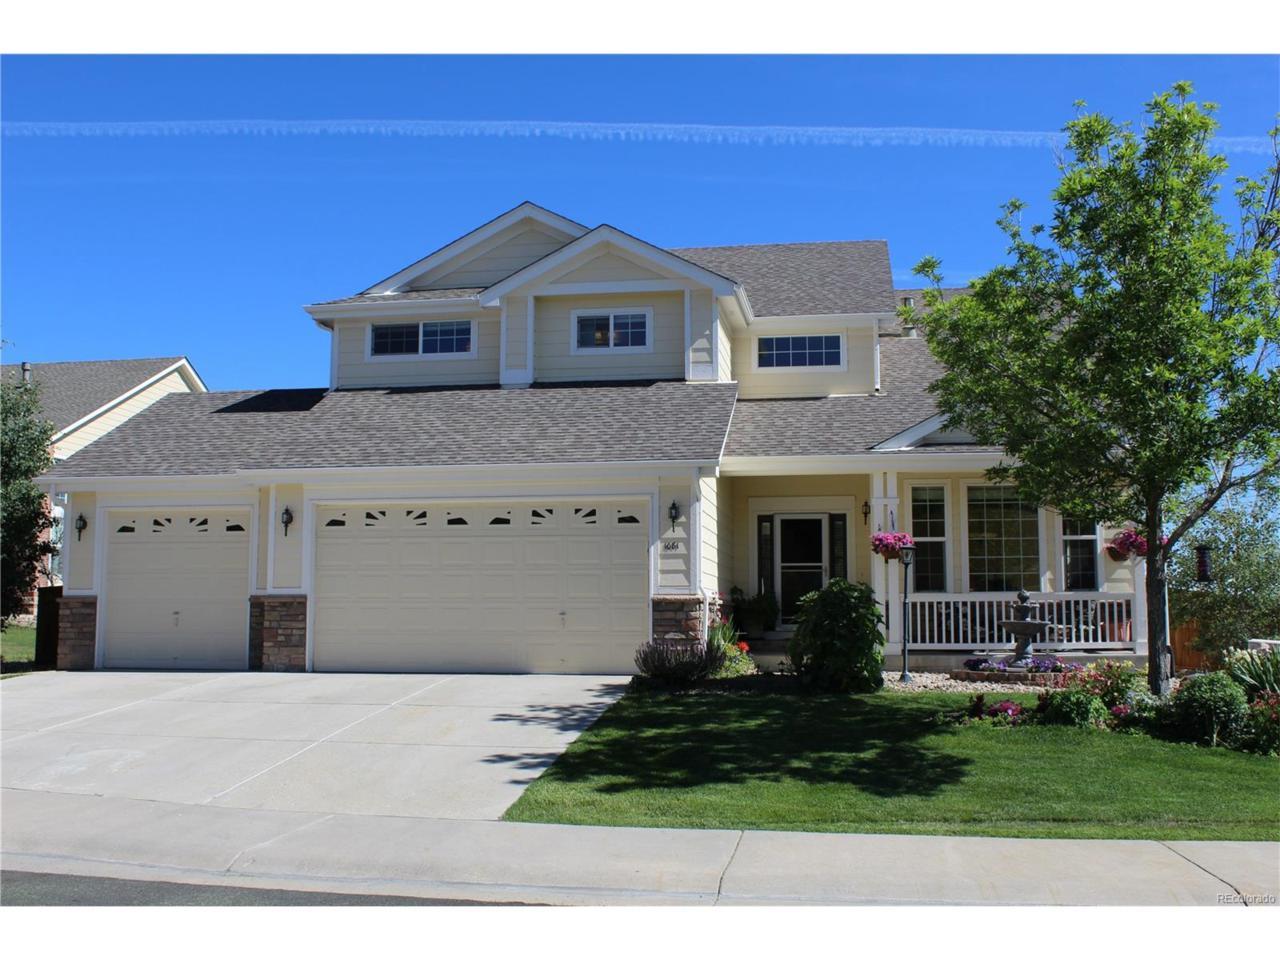 1081 Cryolite Place, Castle Rock, CO 80108 (MLS #8739886) :: 8z Real Estate